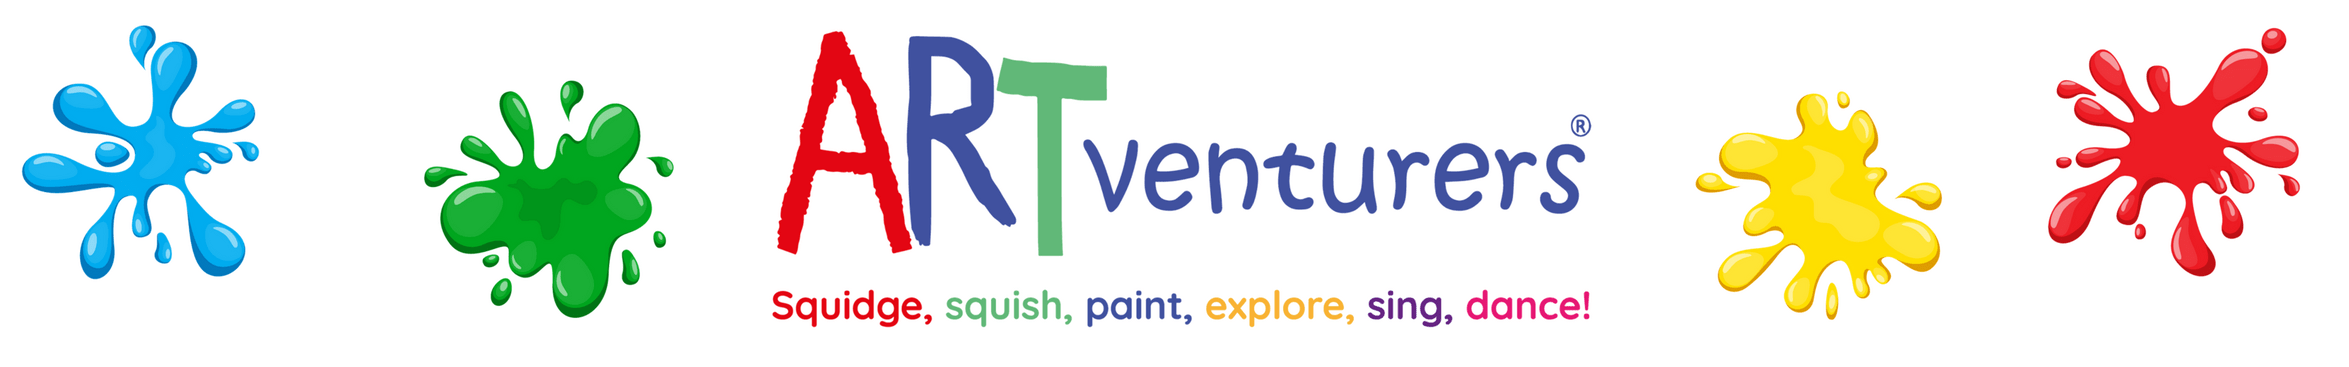 ARTventurers Aire Valley